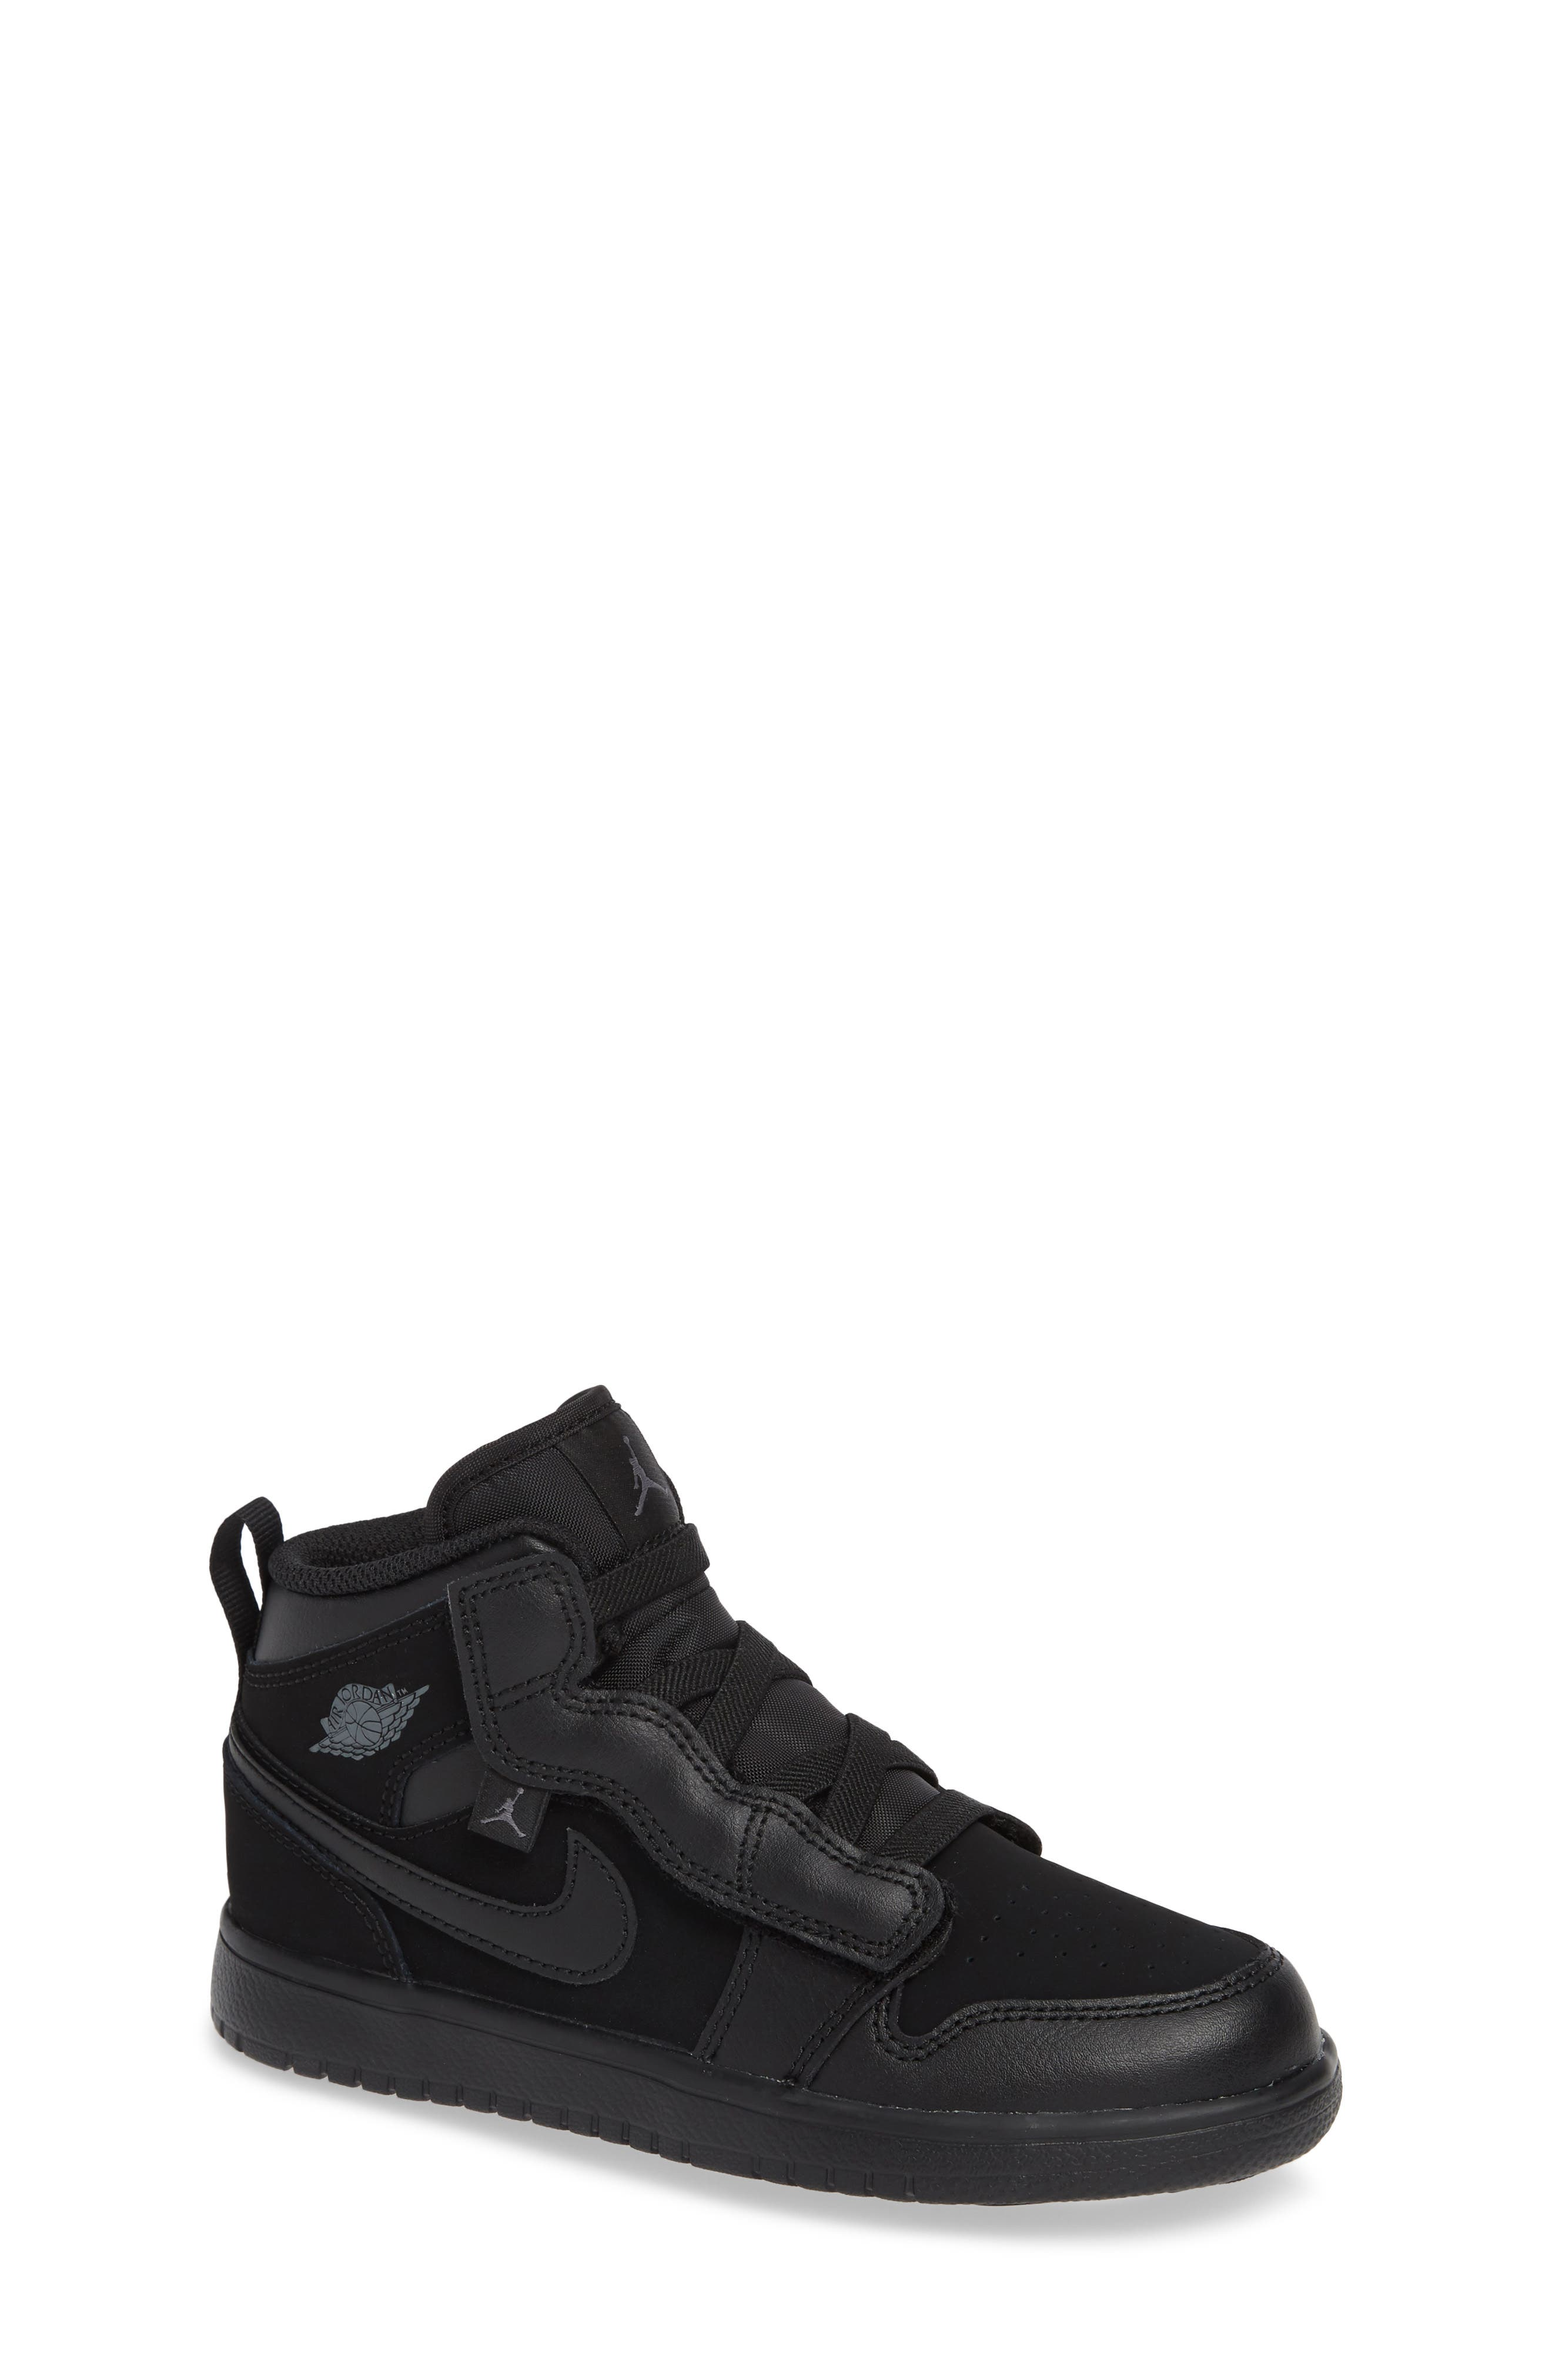 JORDAN 1 Mid Basketball Shoe, Main, color, BLACK/ DARK GREY